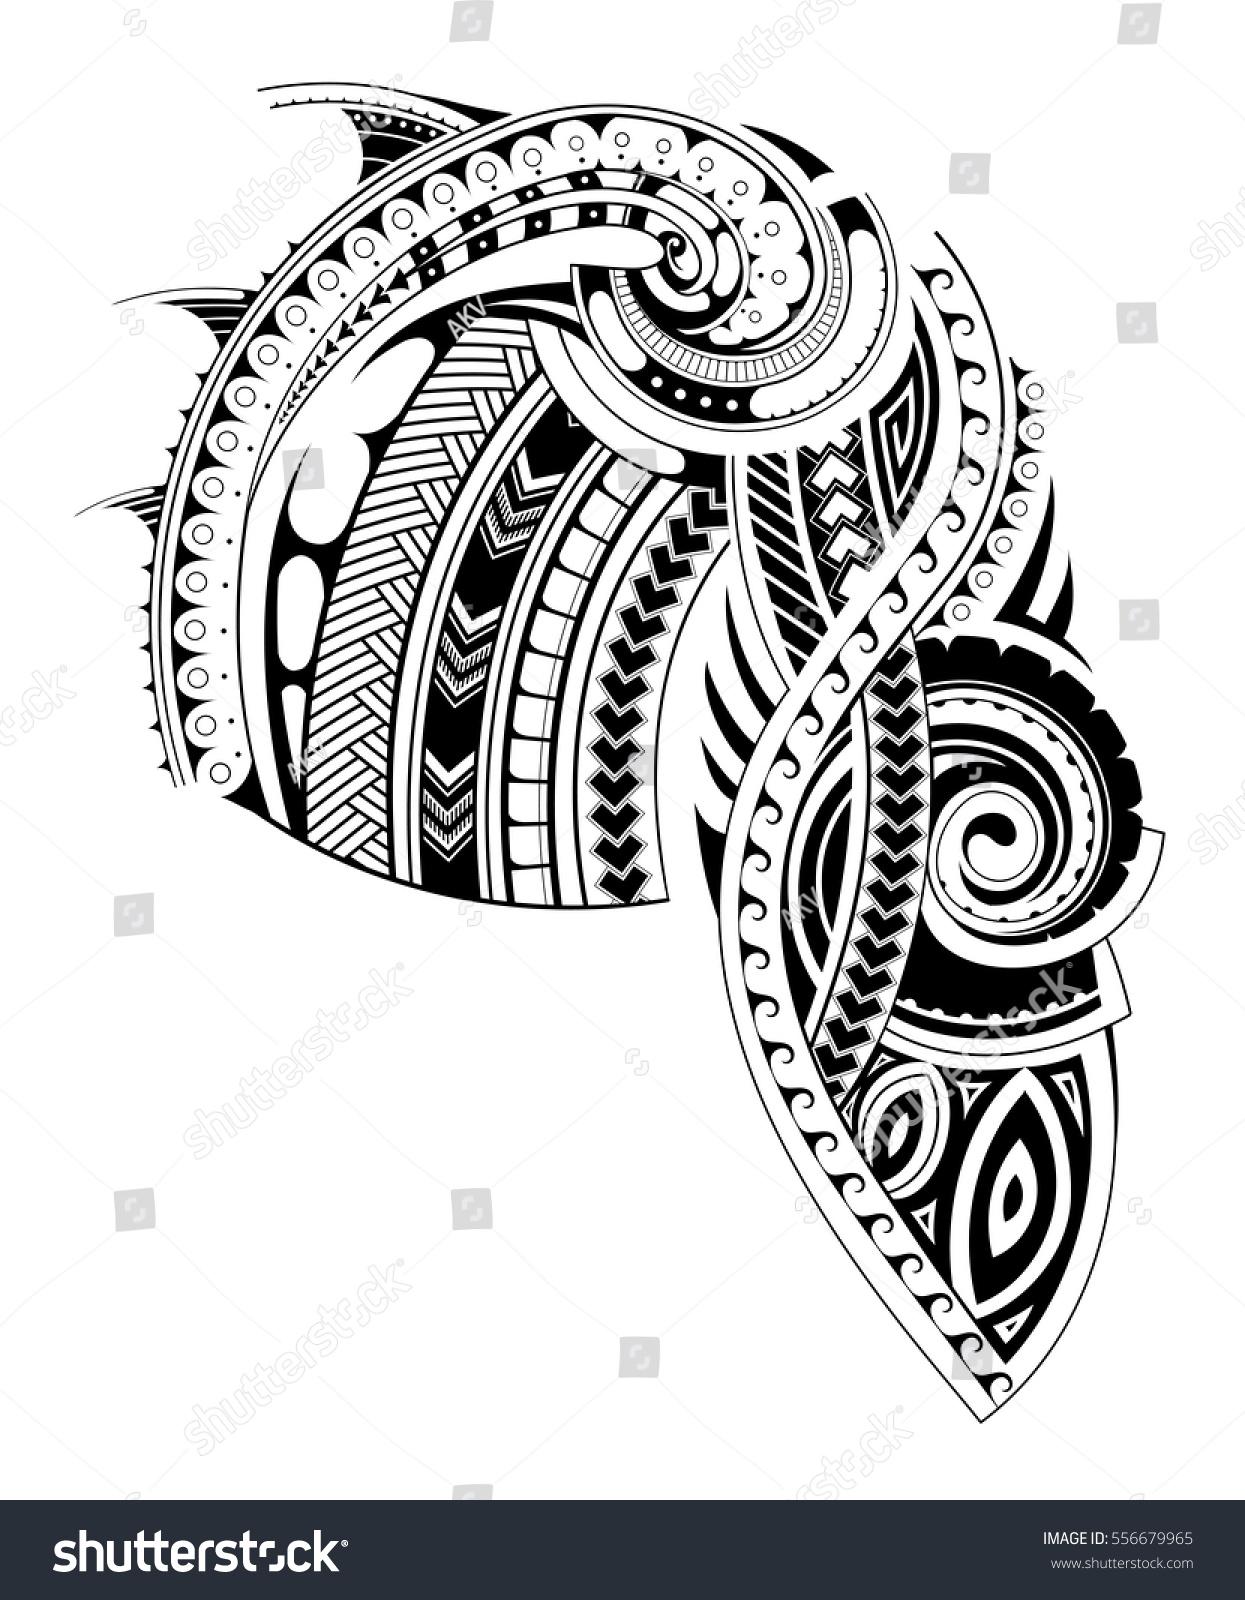 Maori style tattoo design chest sleeve stock vector for Vector tattoo sleeve